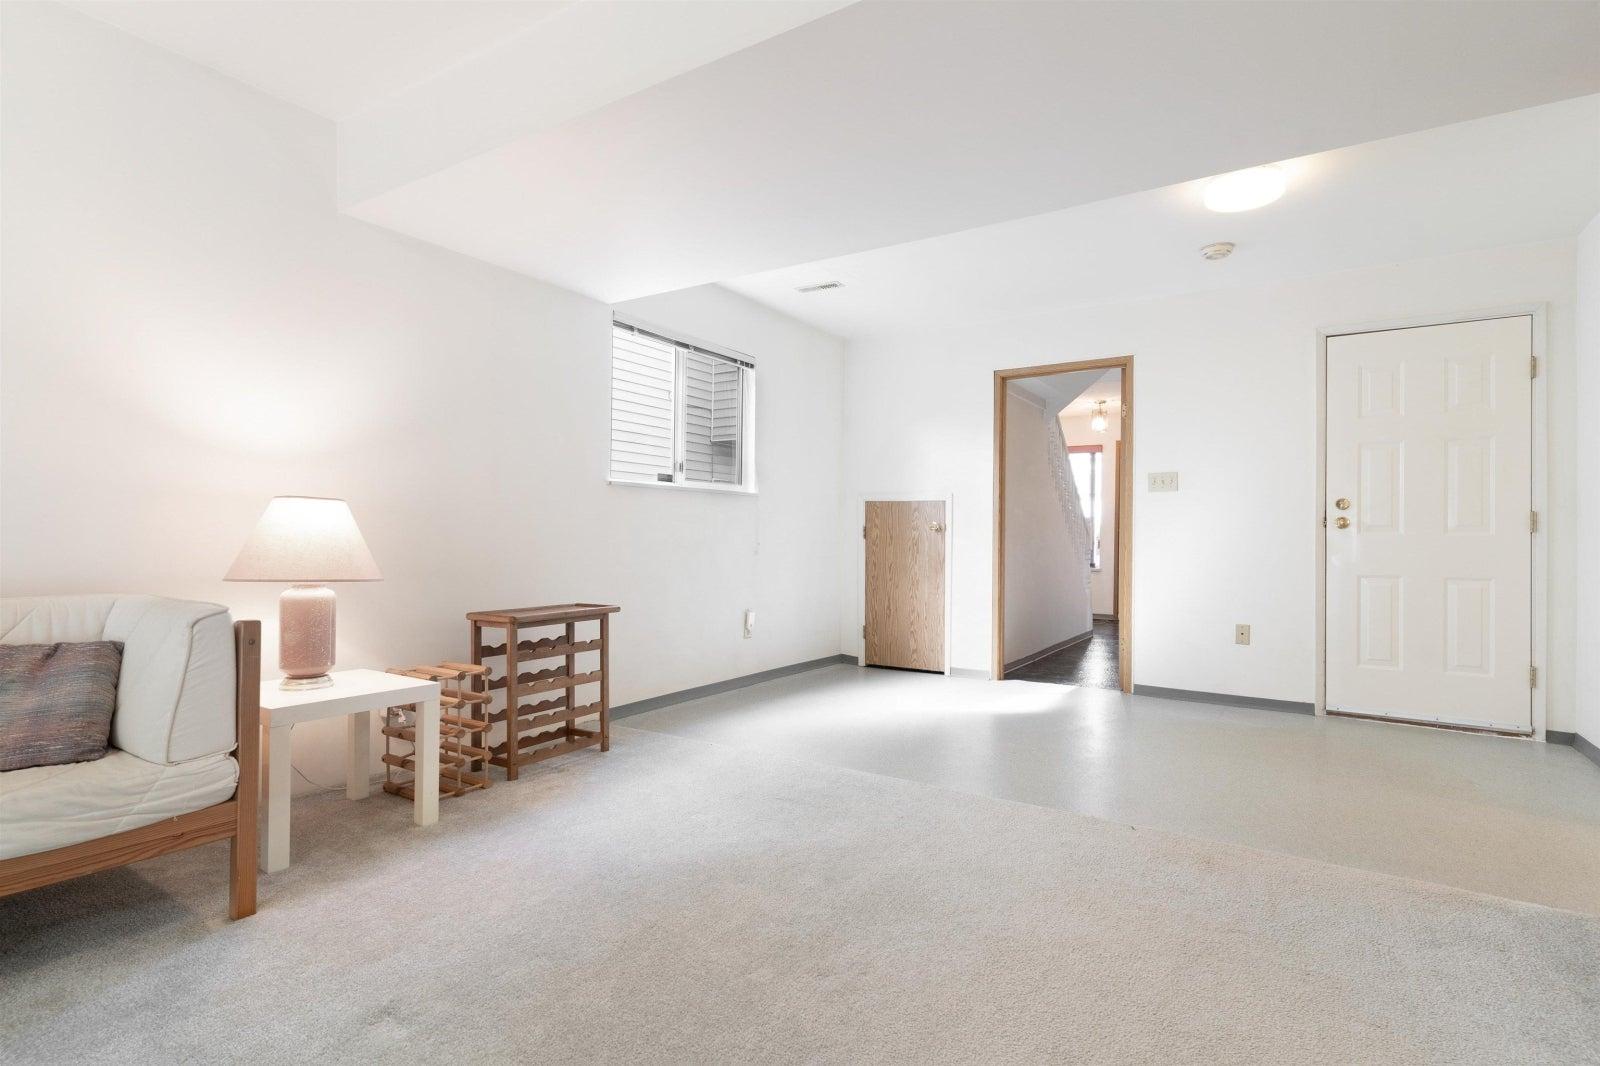 2556 RAVEN COURT - Eagle Ridge CQ House/Single Family for sale, 4 Bedrooms (R2611826) #26